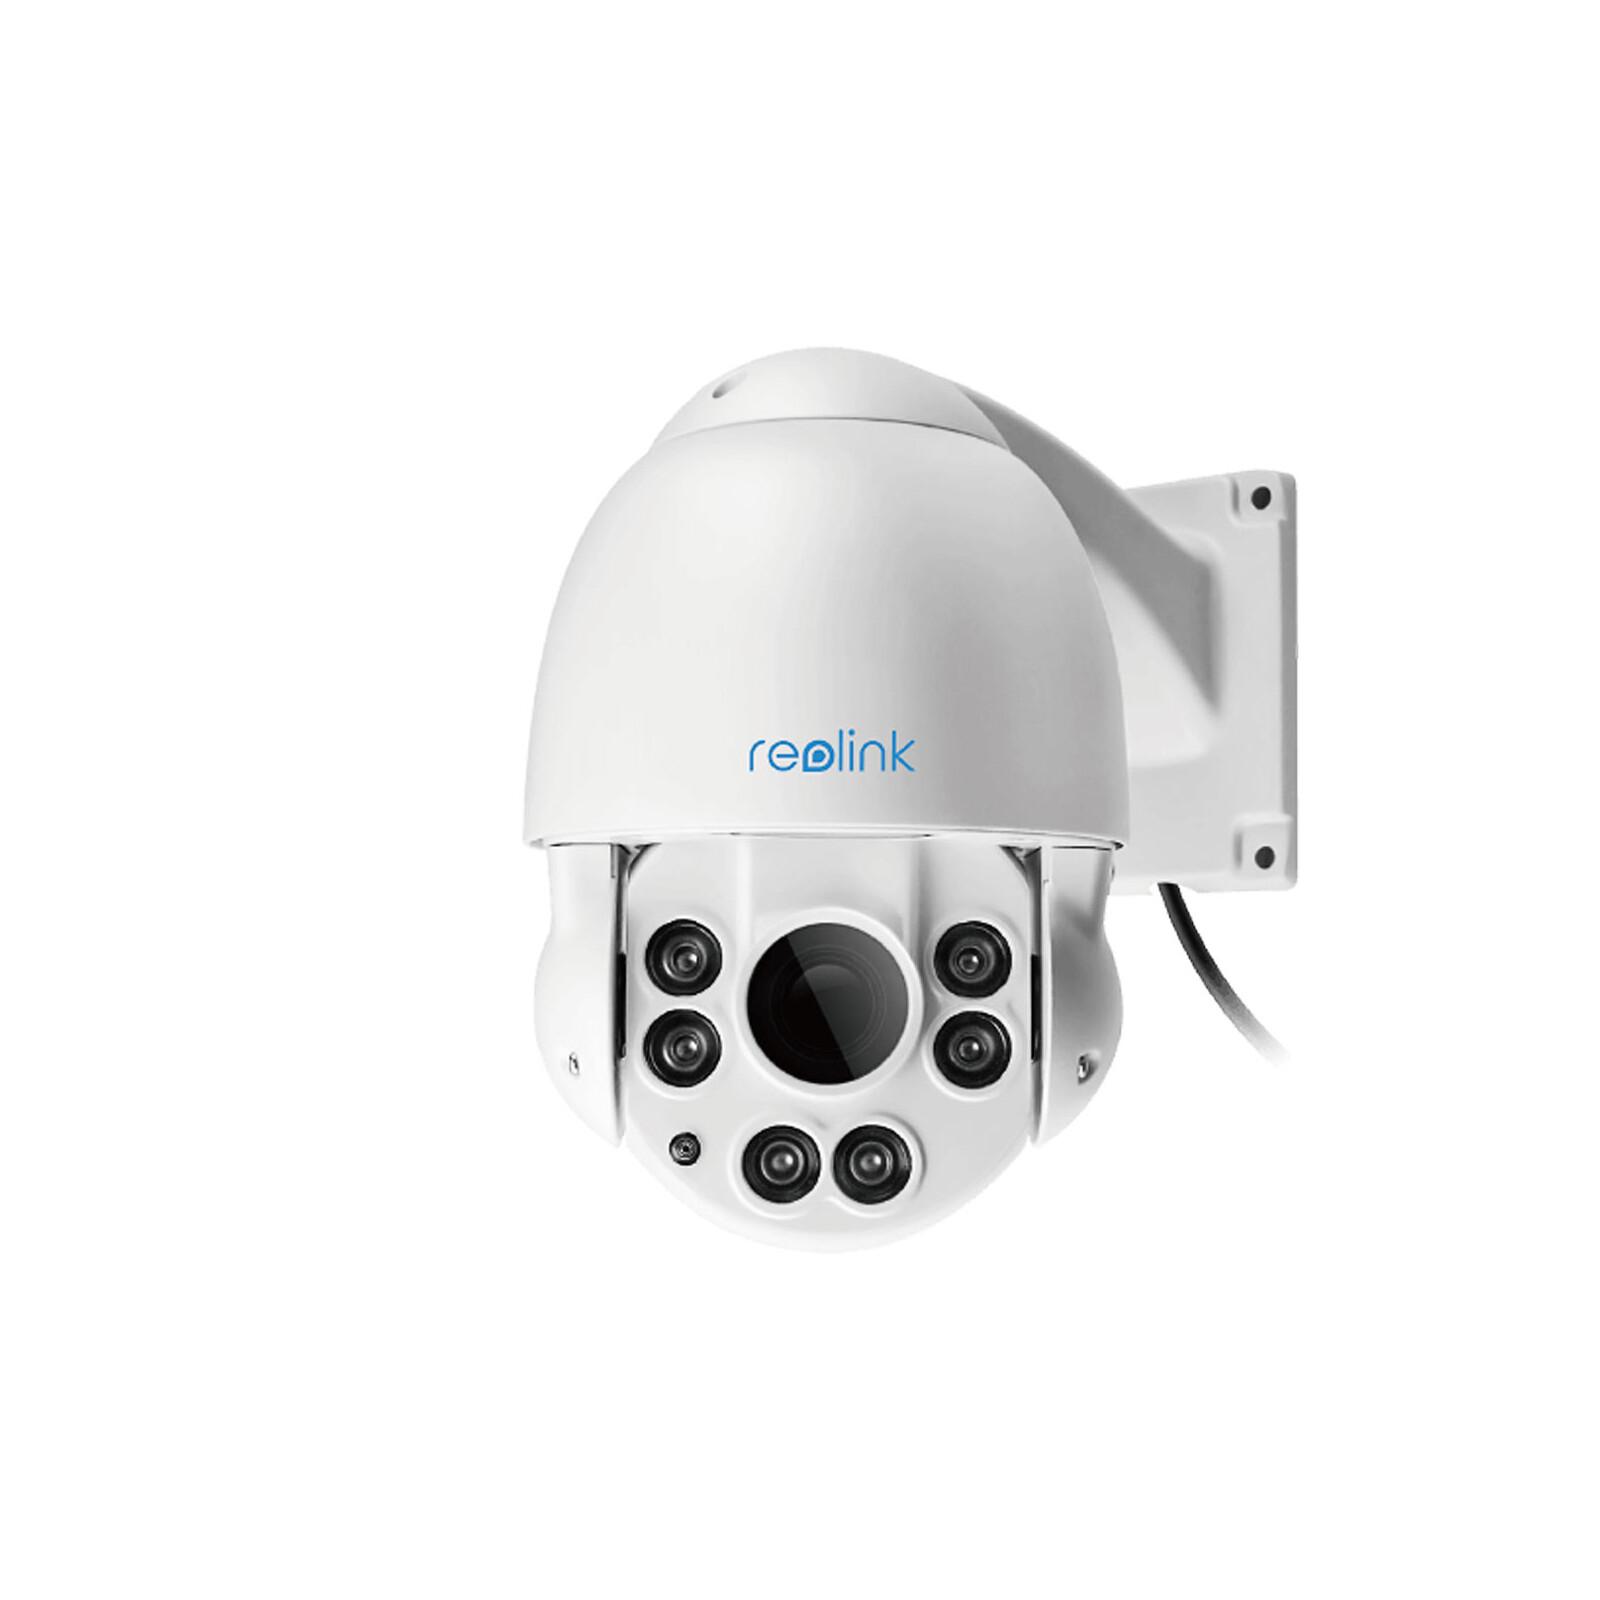 Reolink RLC-423-5MP